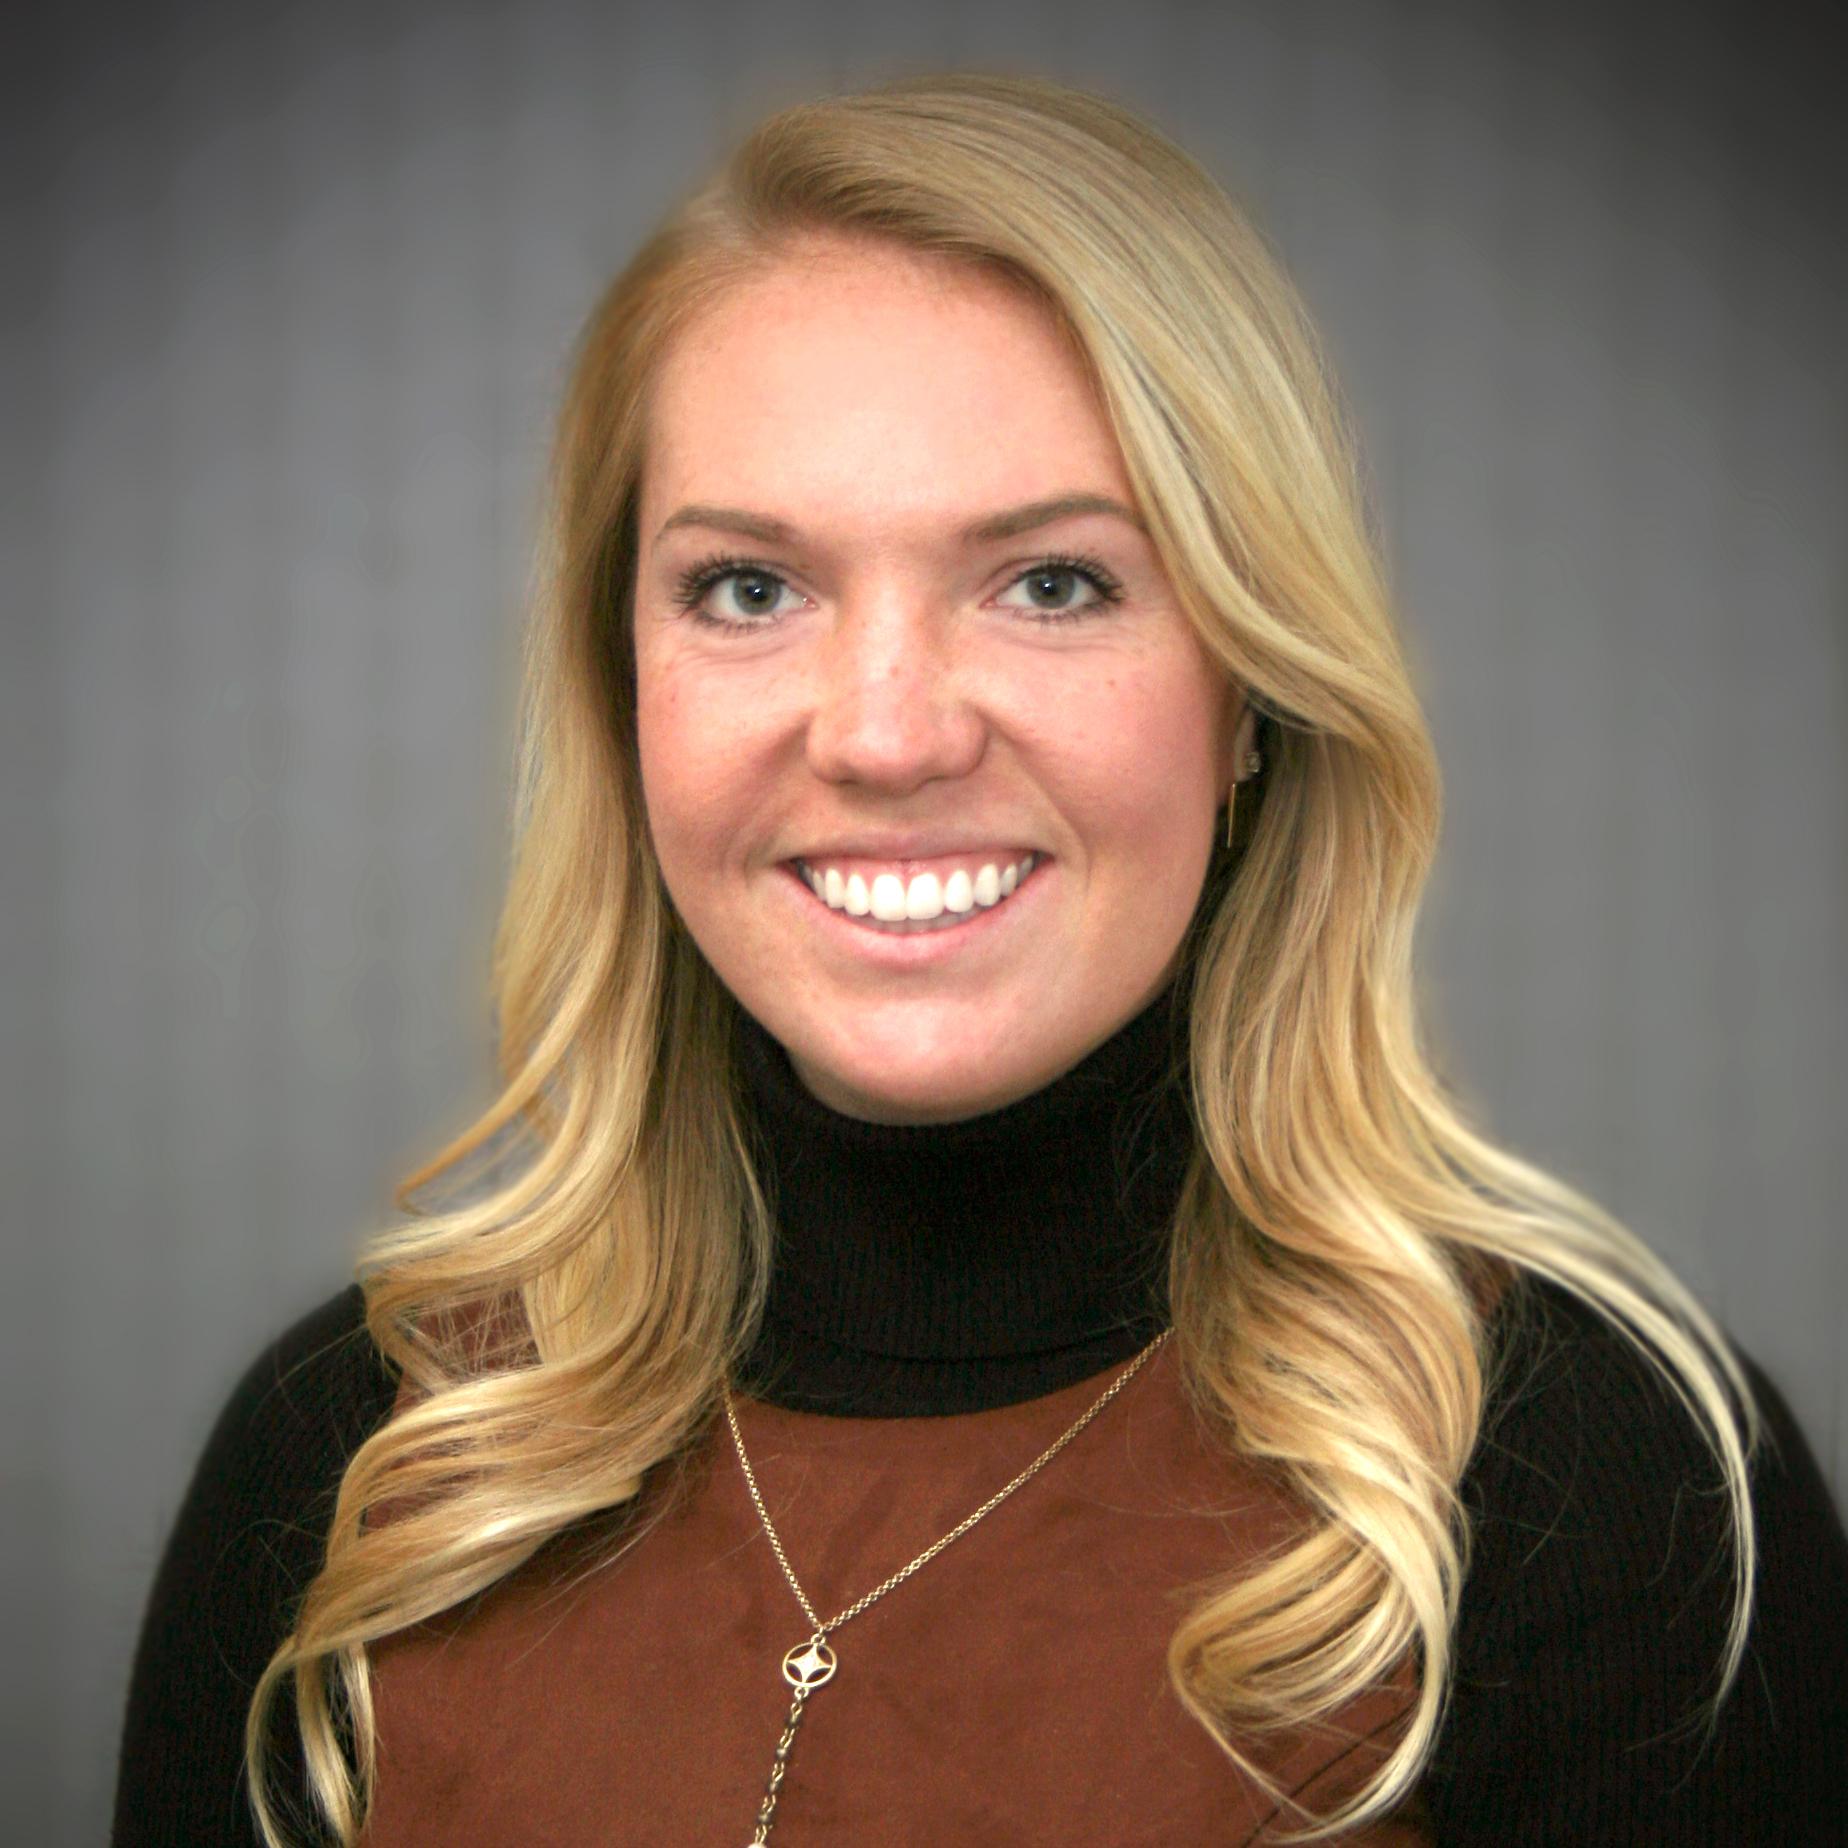 Lauren Falkanger